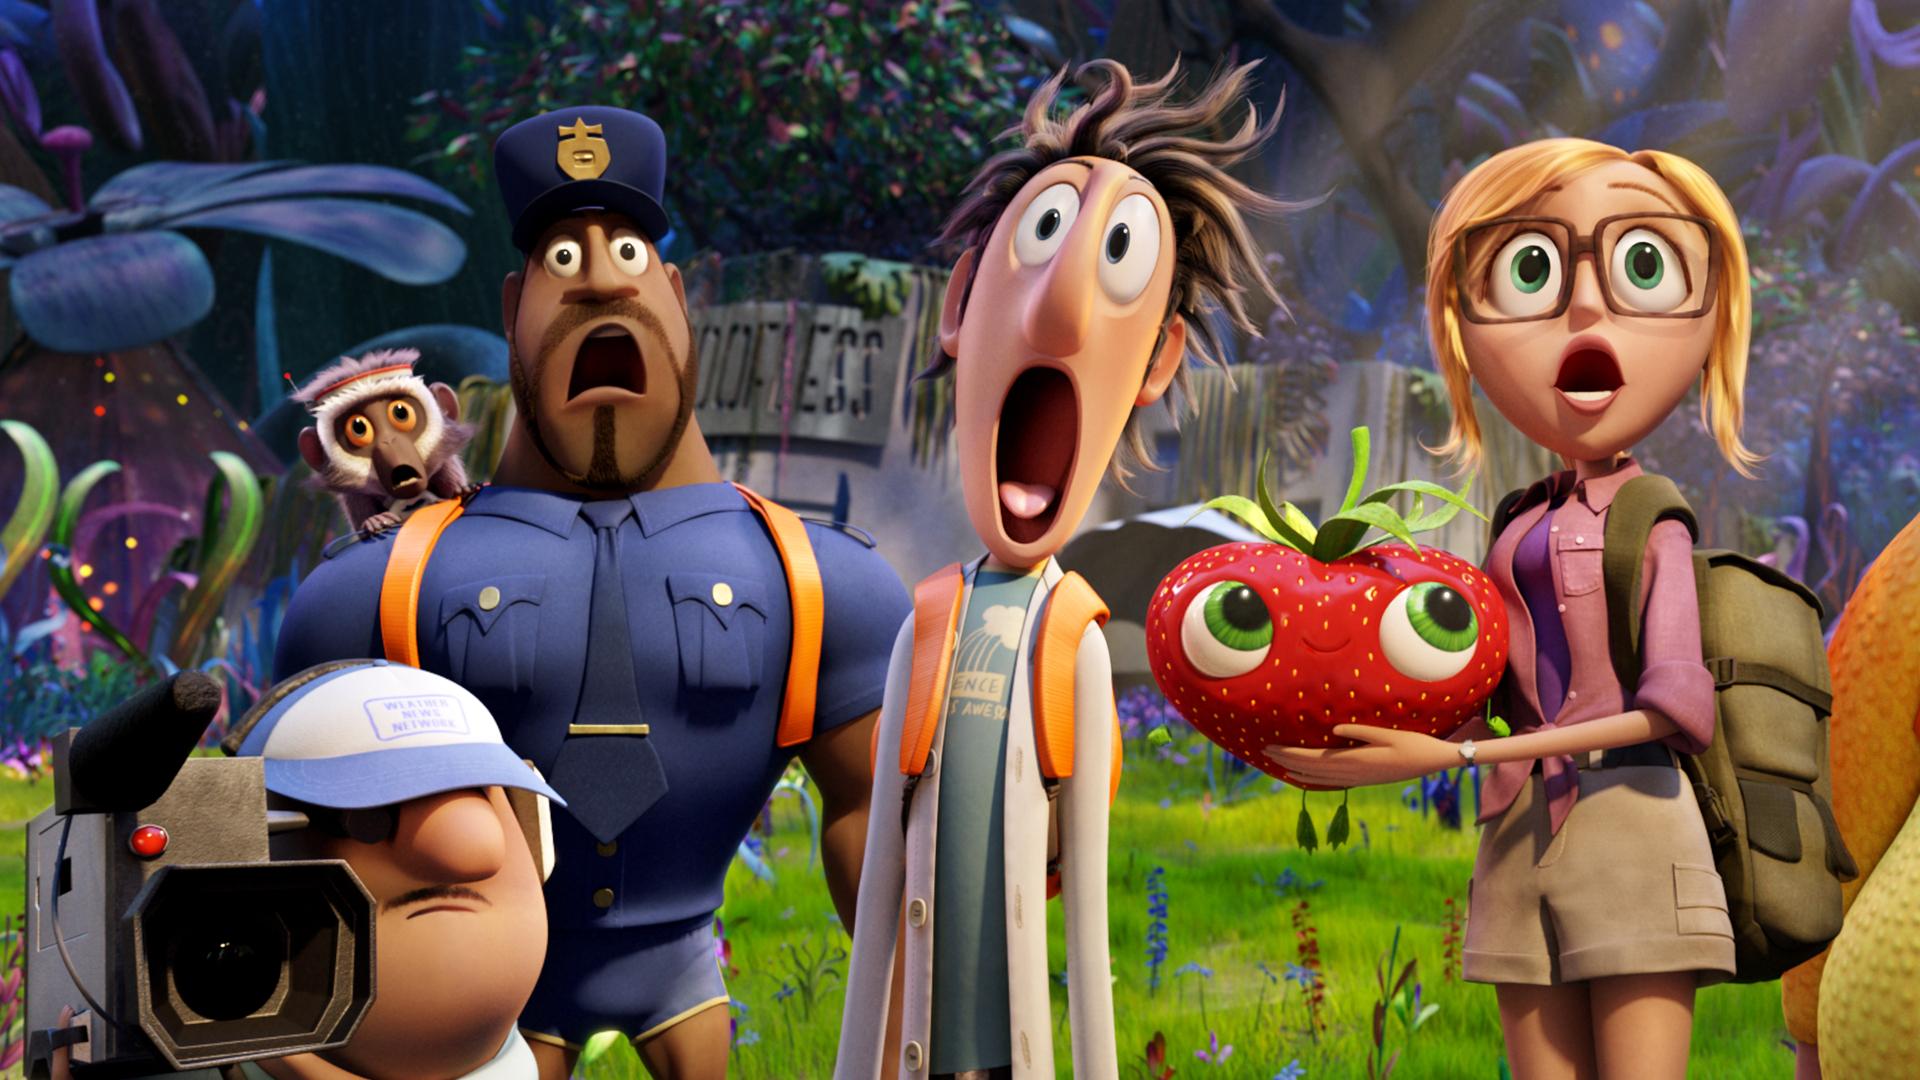 Image from movies.film-cine.com